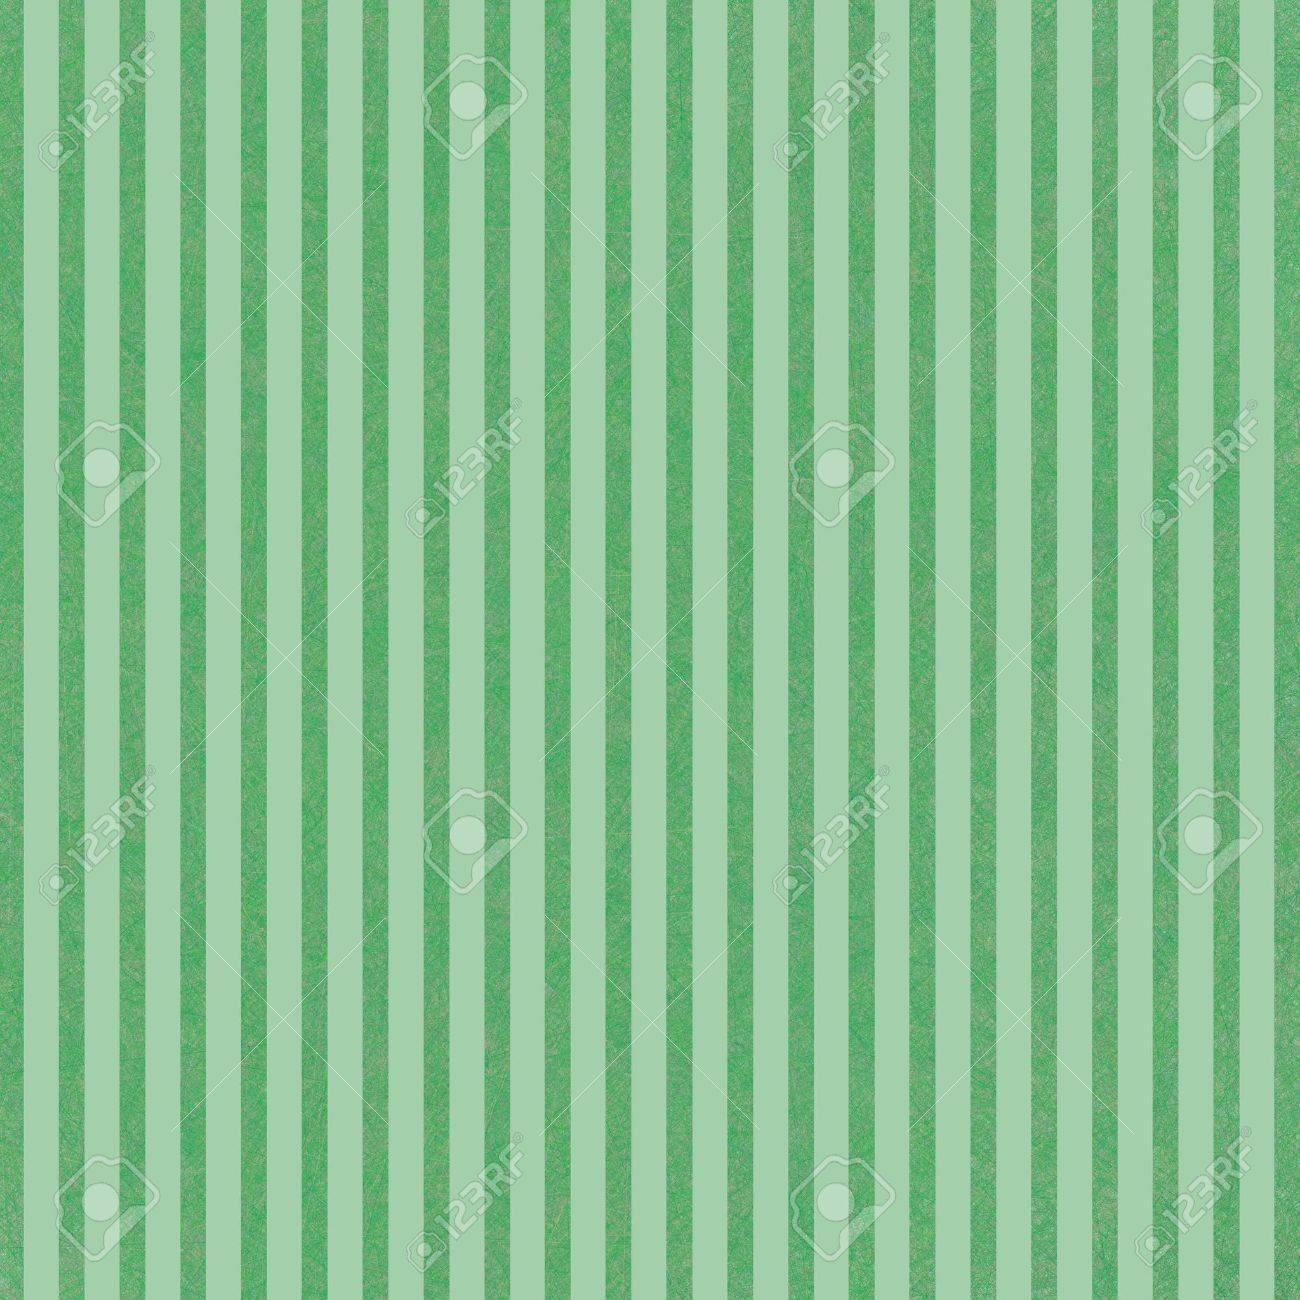 Pinstripe Pattern Cool Design Inspiration